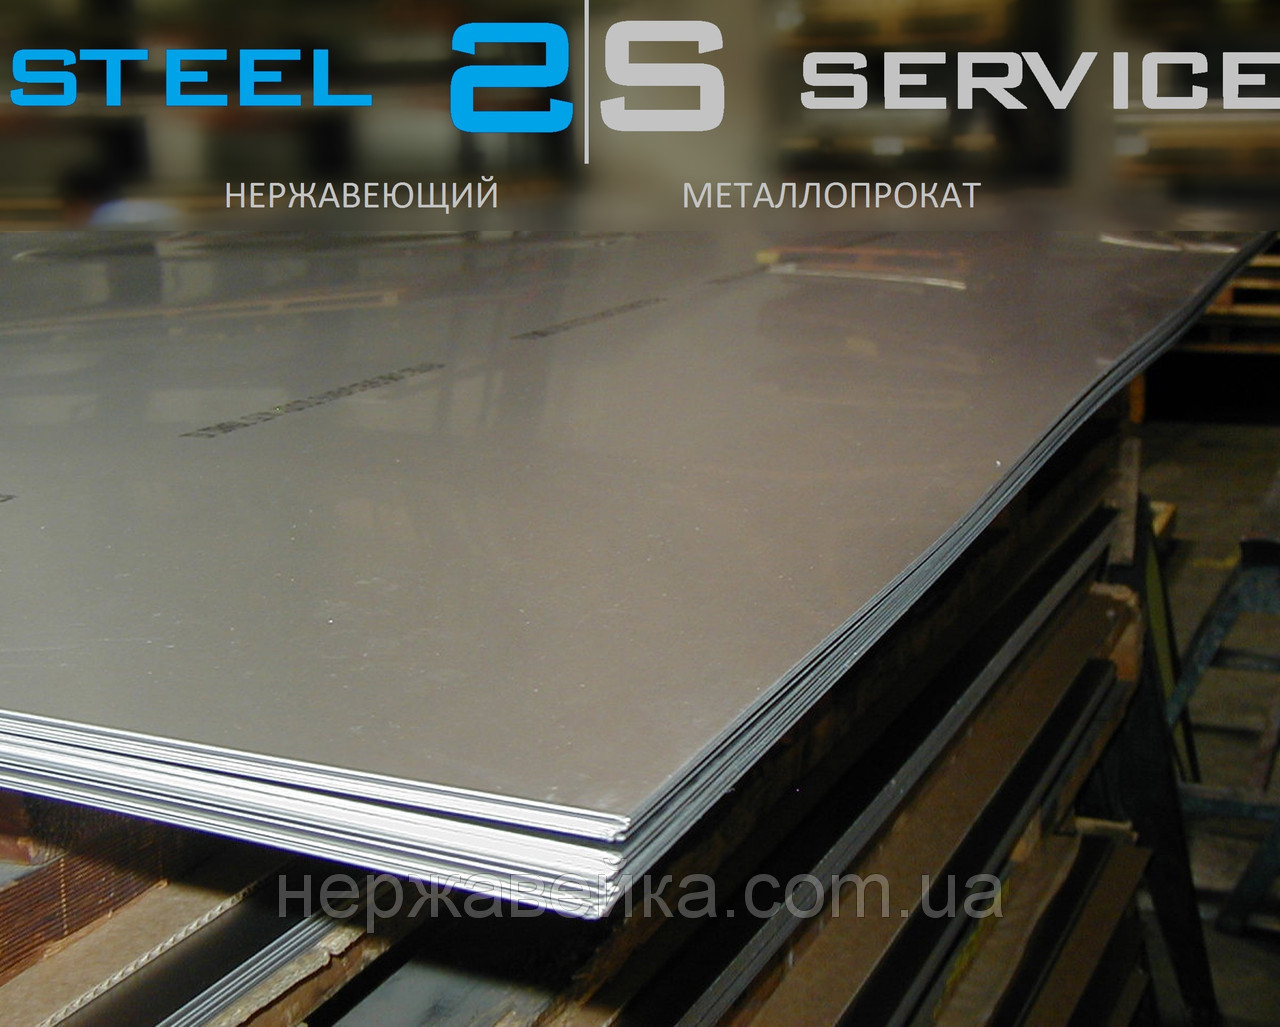 Нержавеющий лист 10х1500х6000мм  AISI 316L(03Х17Н14М3) F1 - горячекатанный,  кислотостойкий